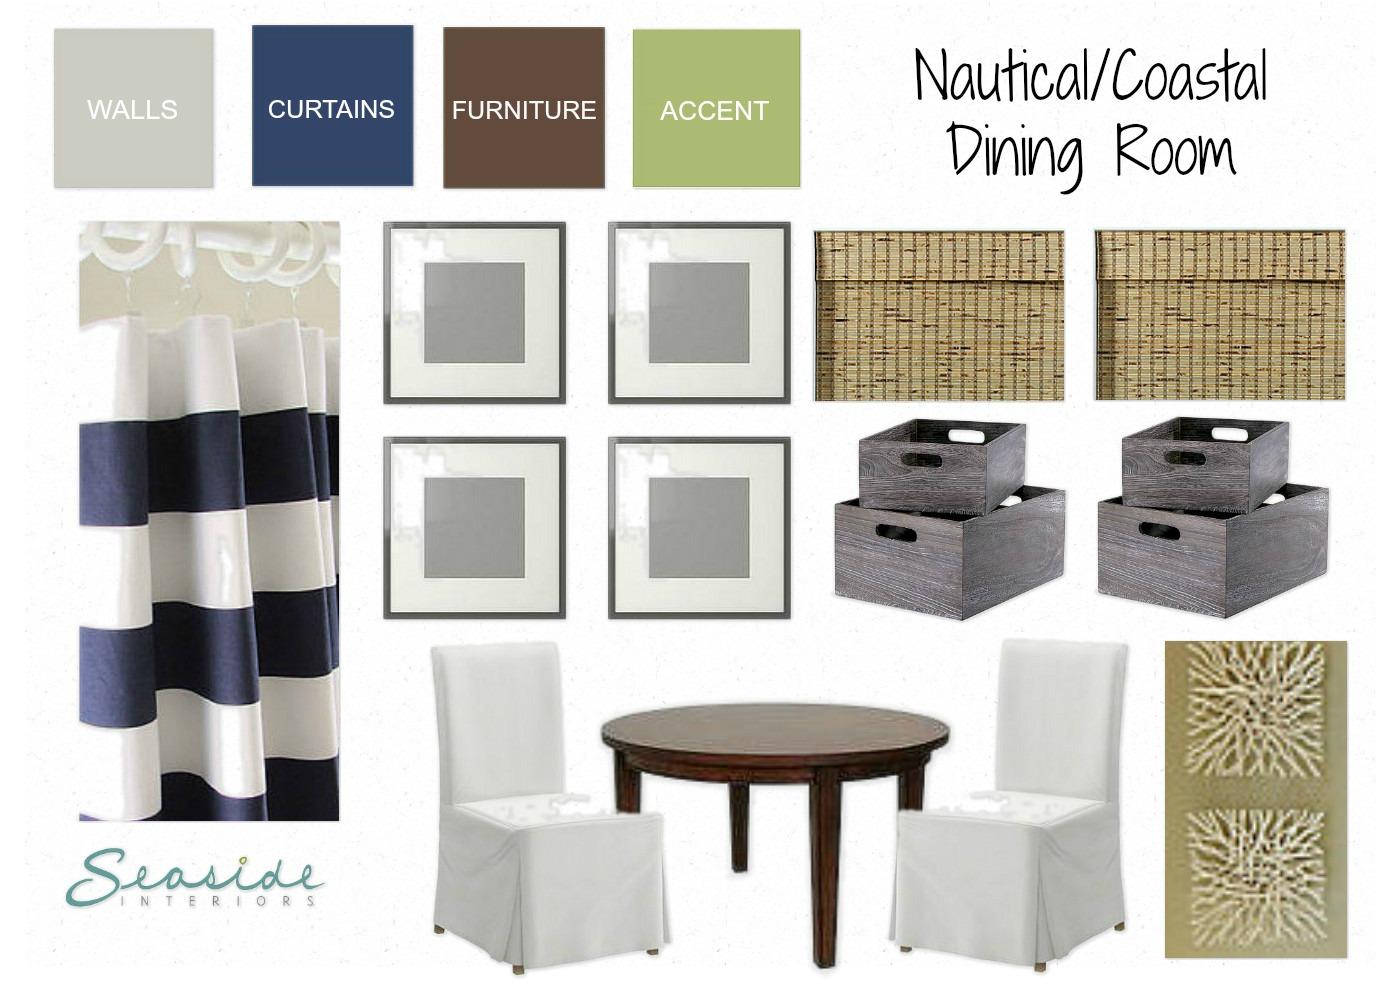 Nautical/Coastal Dining Room Design